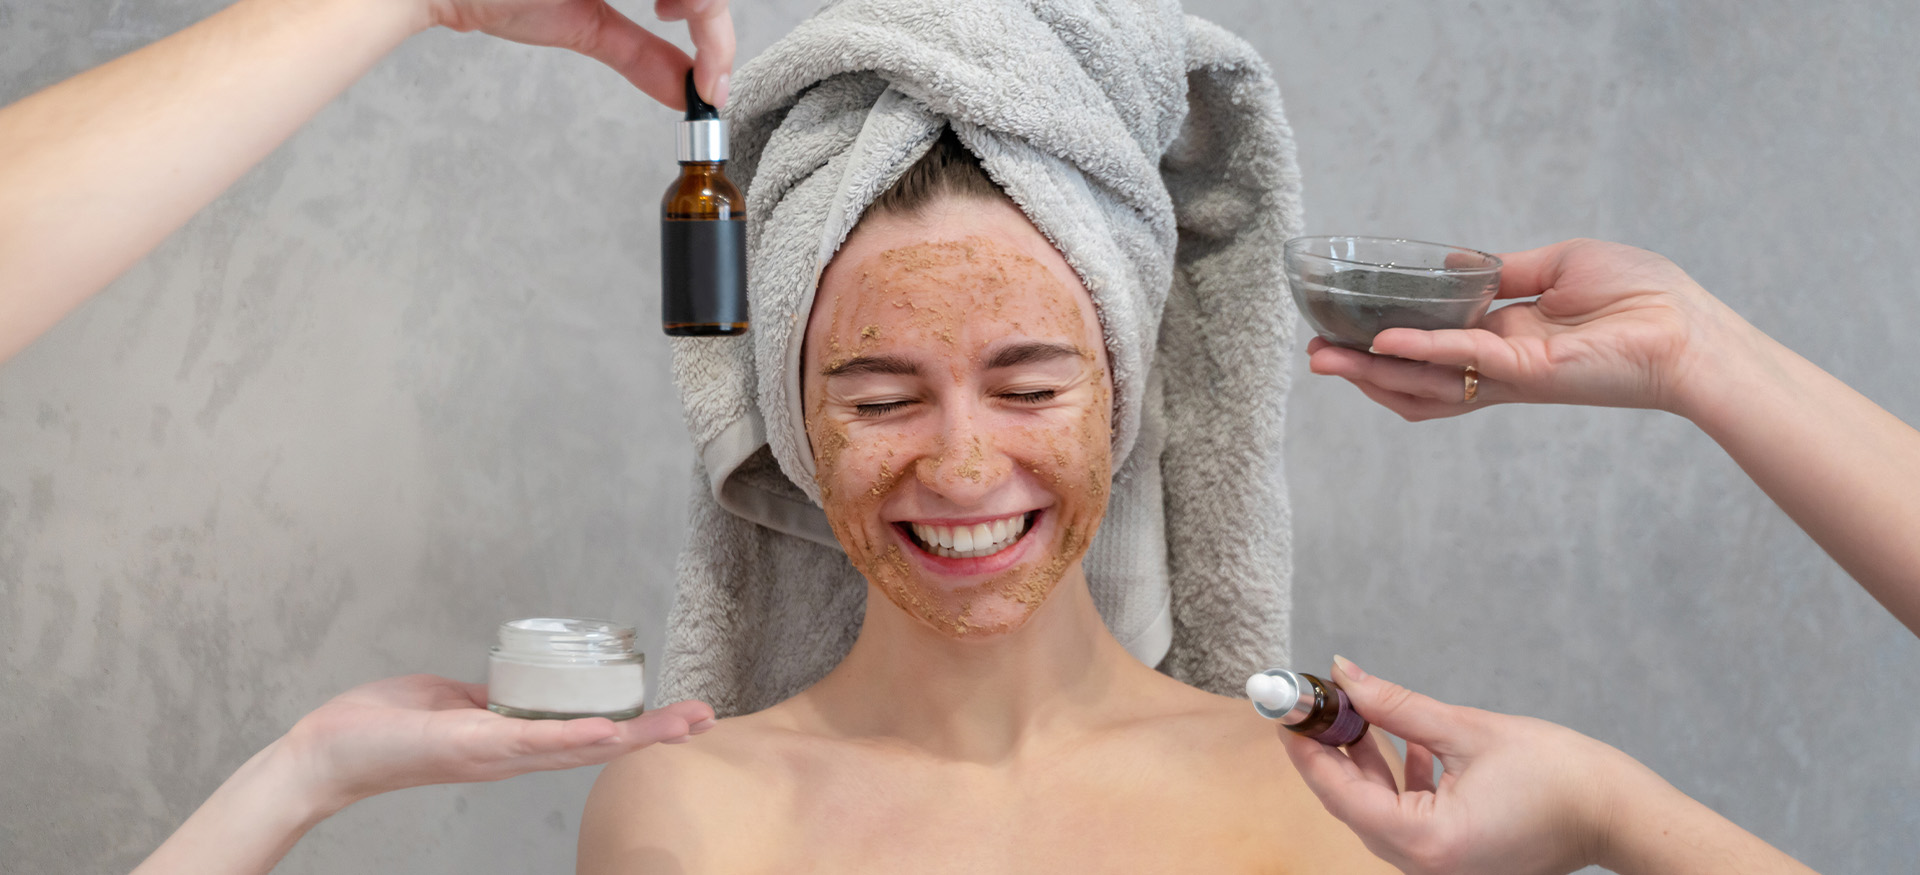 Surprising Skin Benefits of Exfoliating With The Walnut Scrub